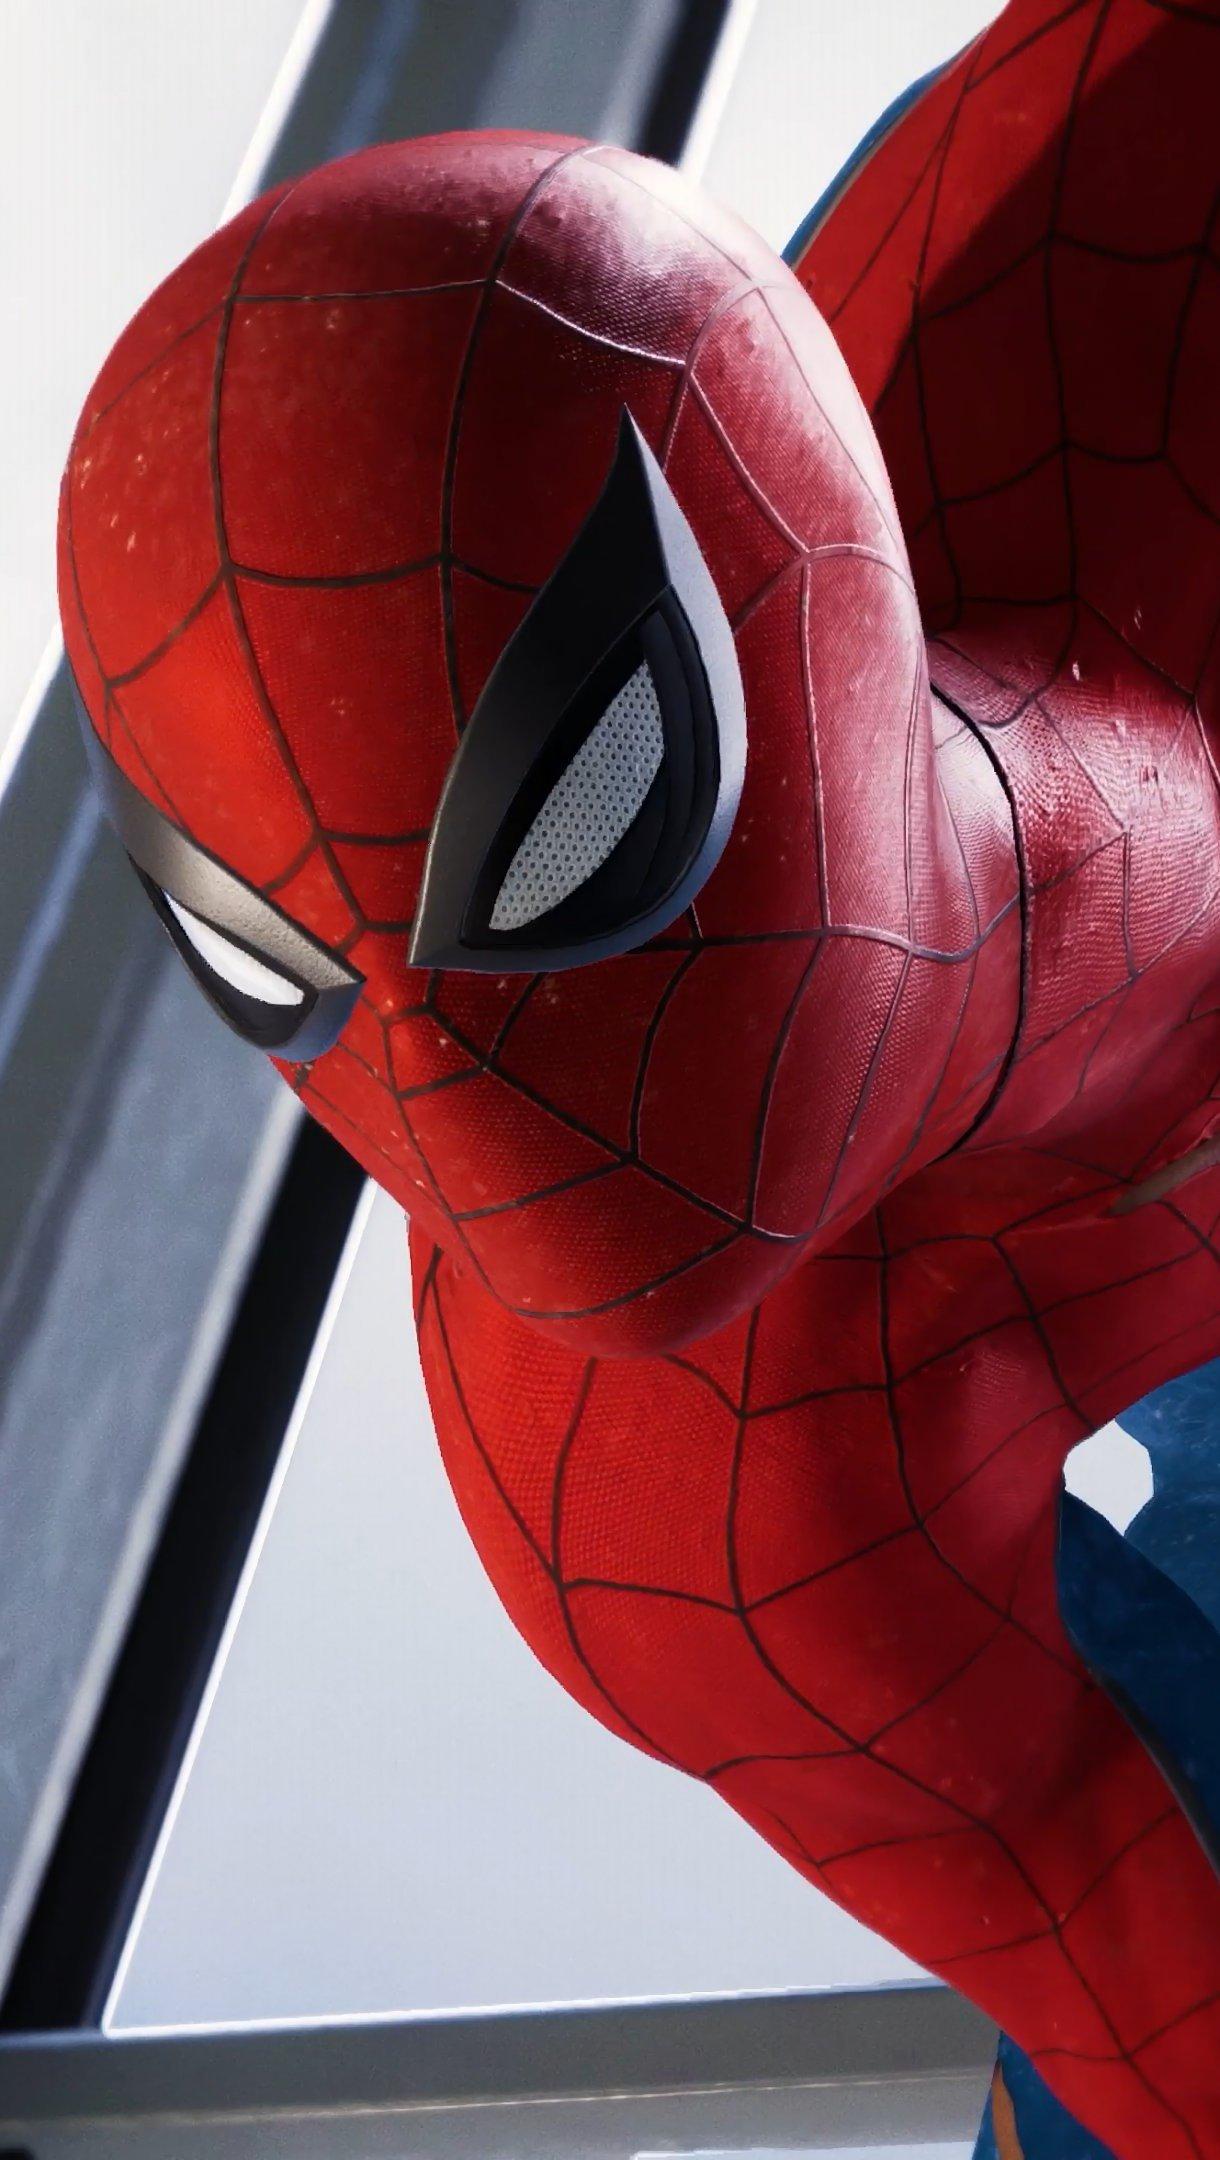 Fondos de pantalla Spider-Man PS4 observando Vertical